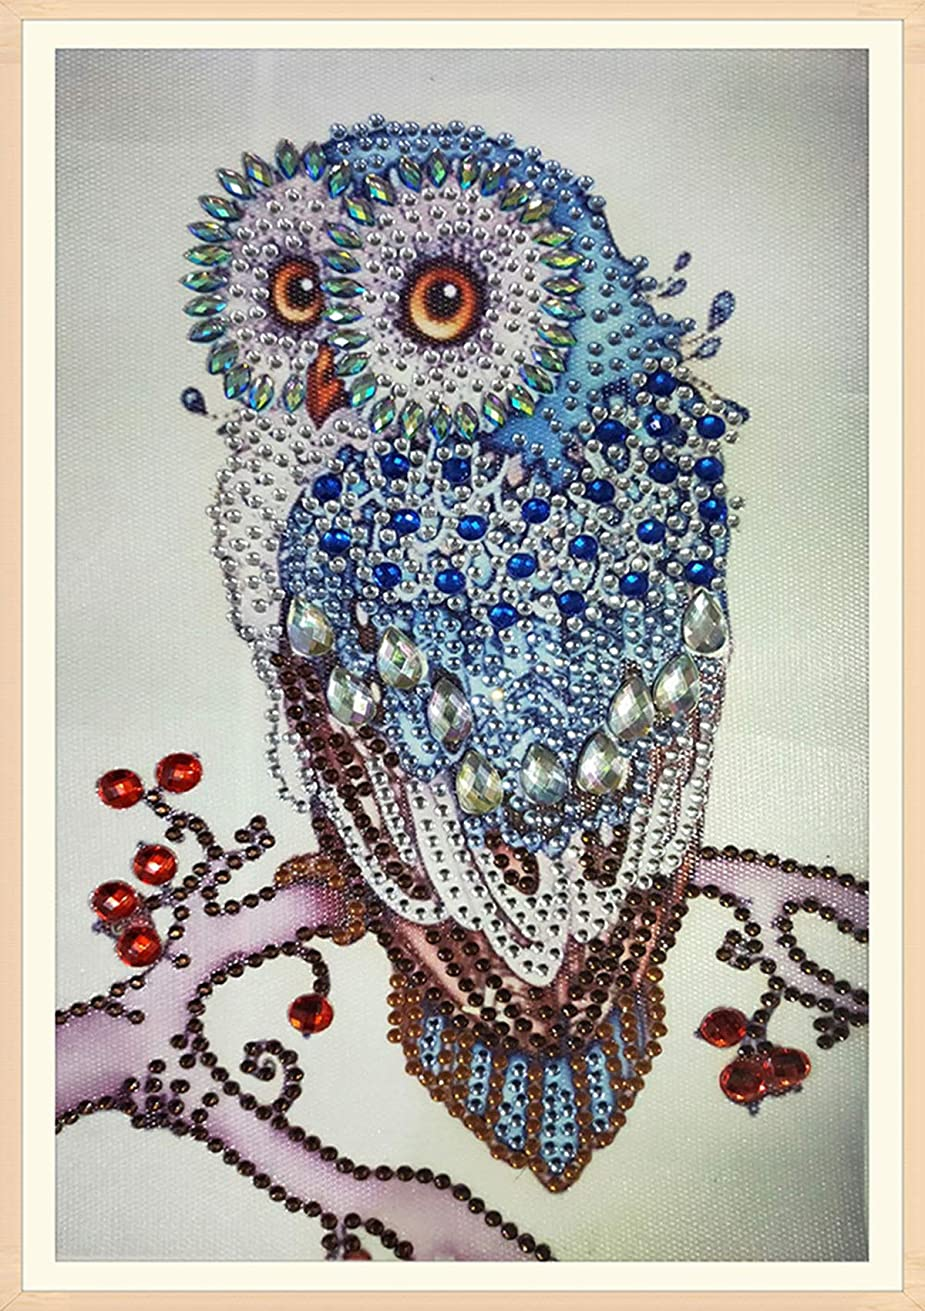 5D Diamond Painting Kits for Kids & Adult Cute Owl Cartoon Animal Diamond Oil Painting DIY Living Room Rhinestone Cross Stitch Arts Craft Supply for Home Wall Decor Ross Beauty